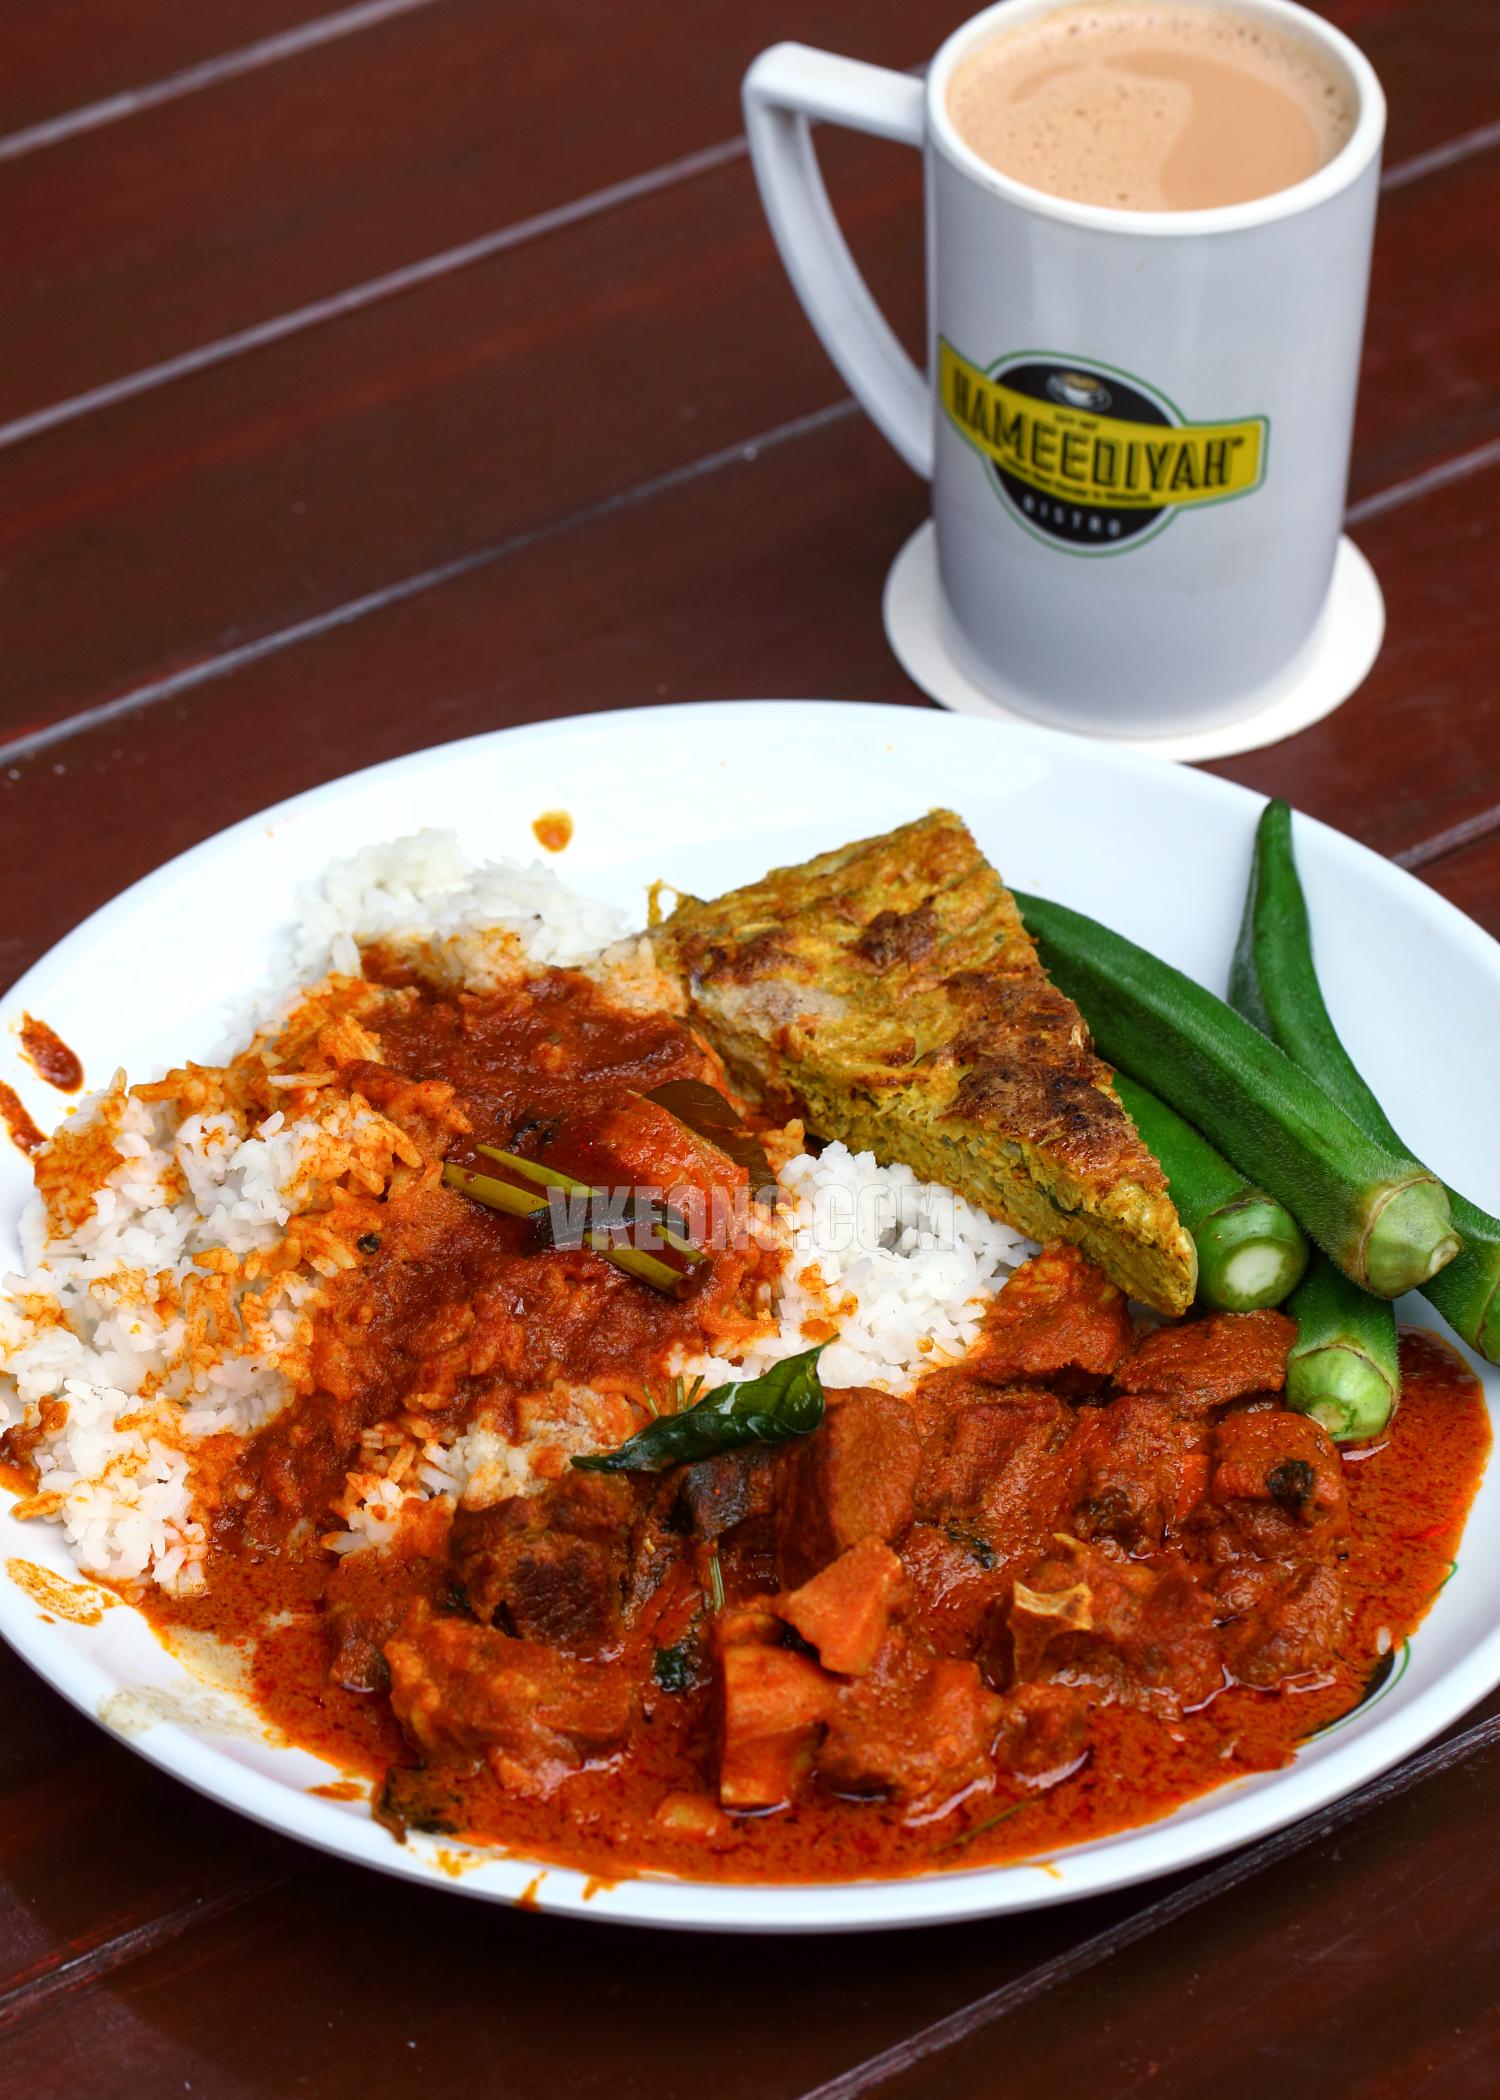 Hameediyah-Nasi-Kandar-Mutton